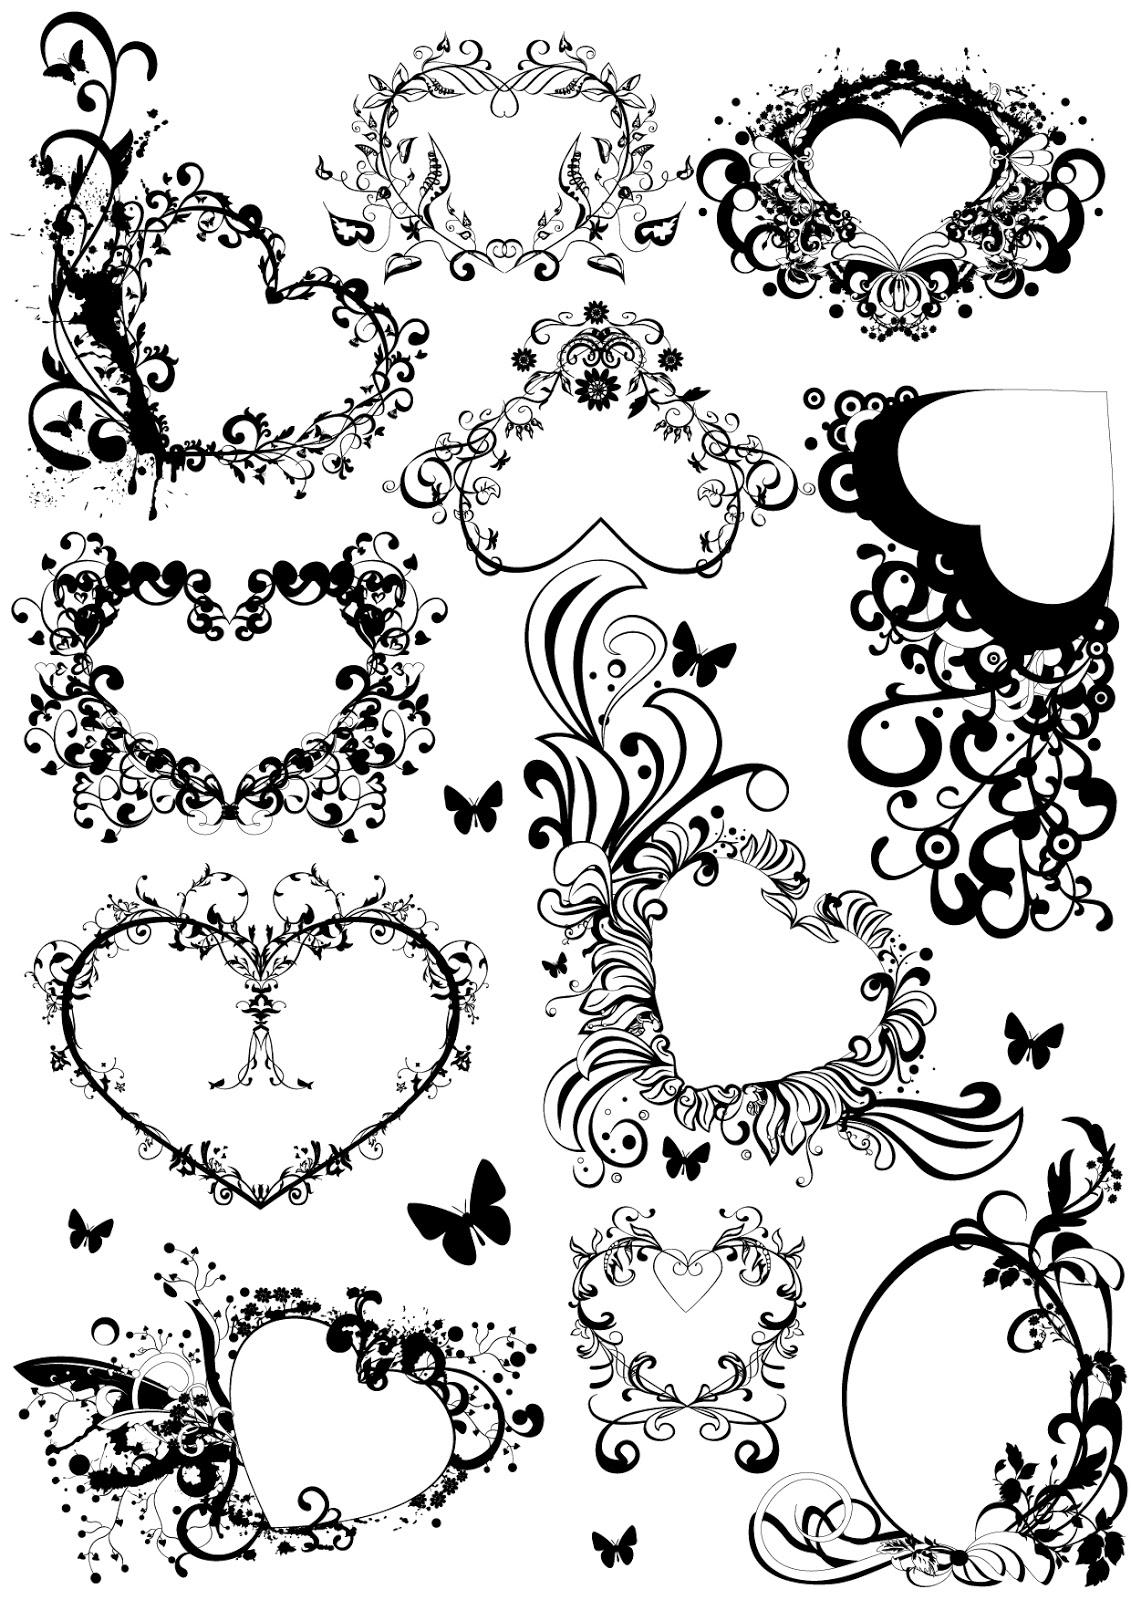 http://2.bp.blogspot.com/_Qwn4SQSxYas/TScm-ThwIYI/AAAAAAAAAC0/oJJdHrPrXnw/s1600/ornamental%2Bhearts.jpg